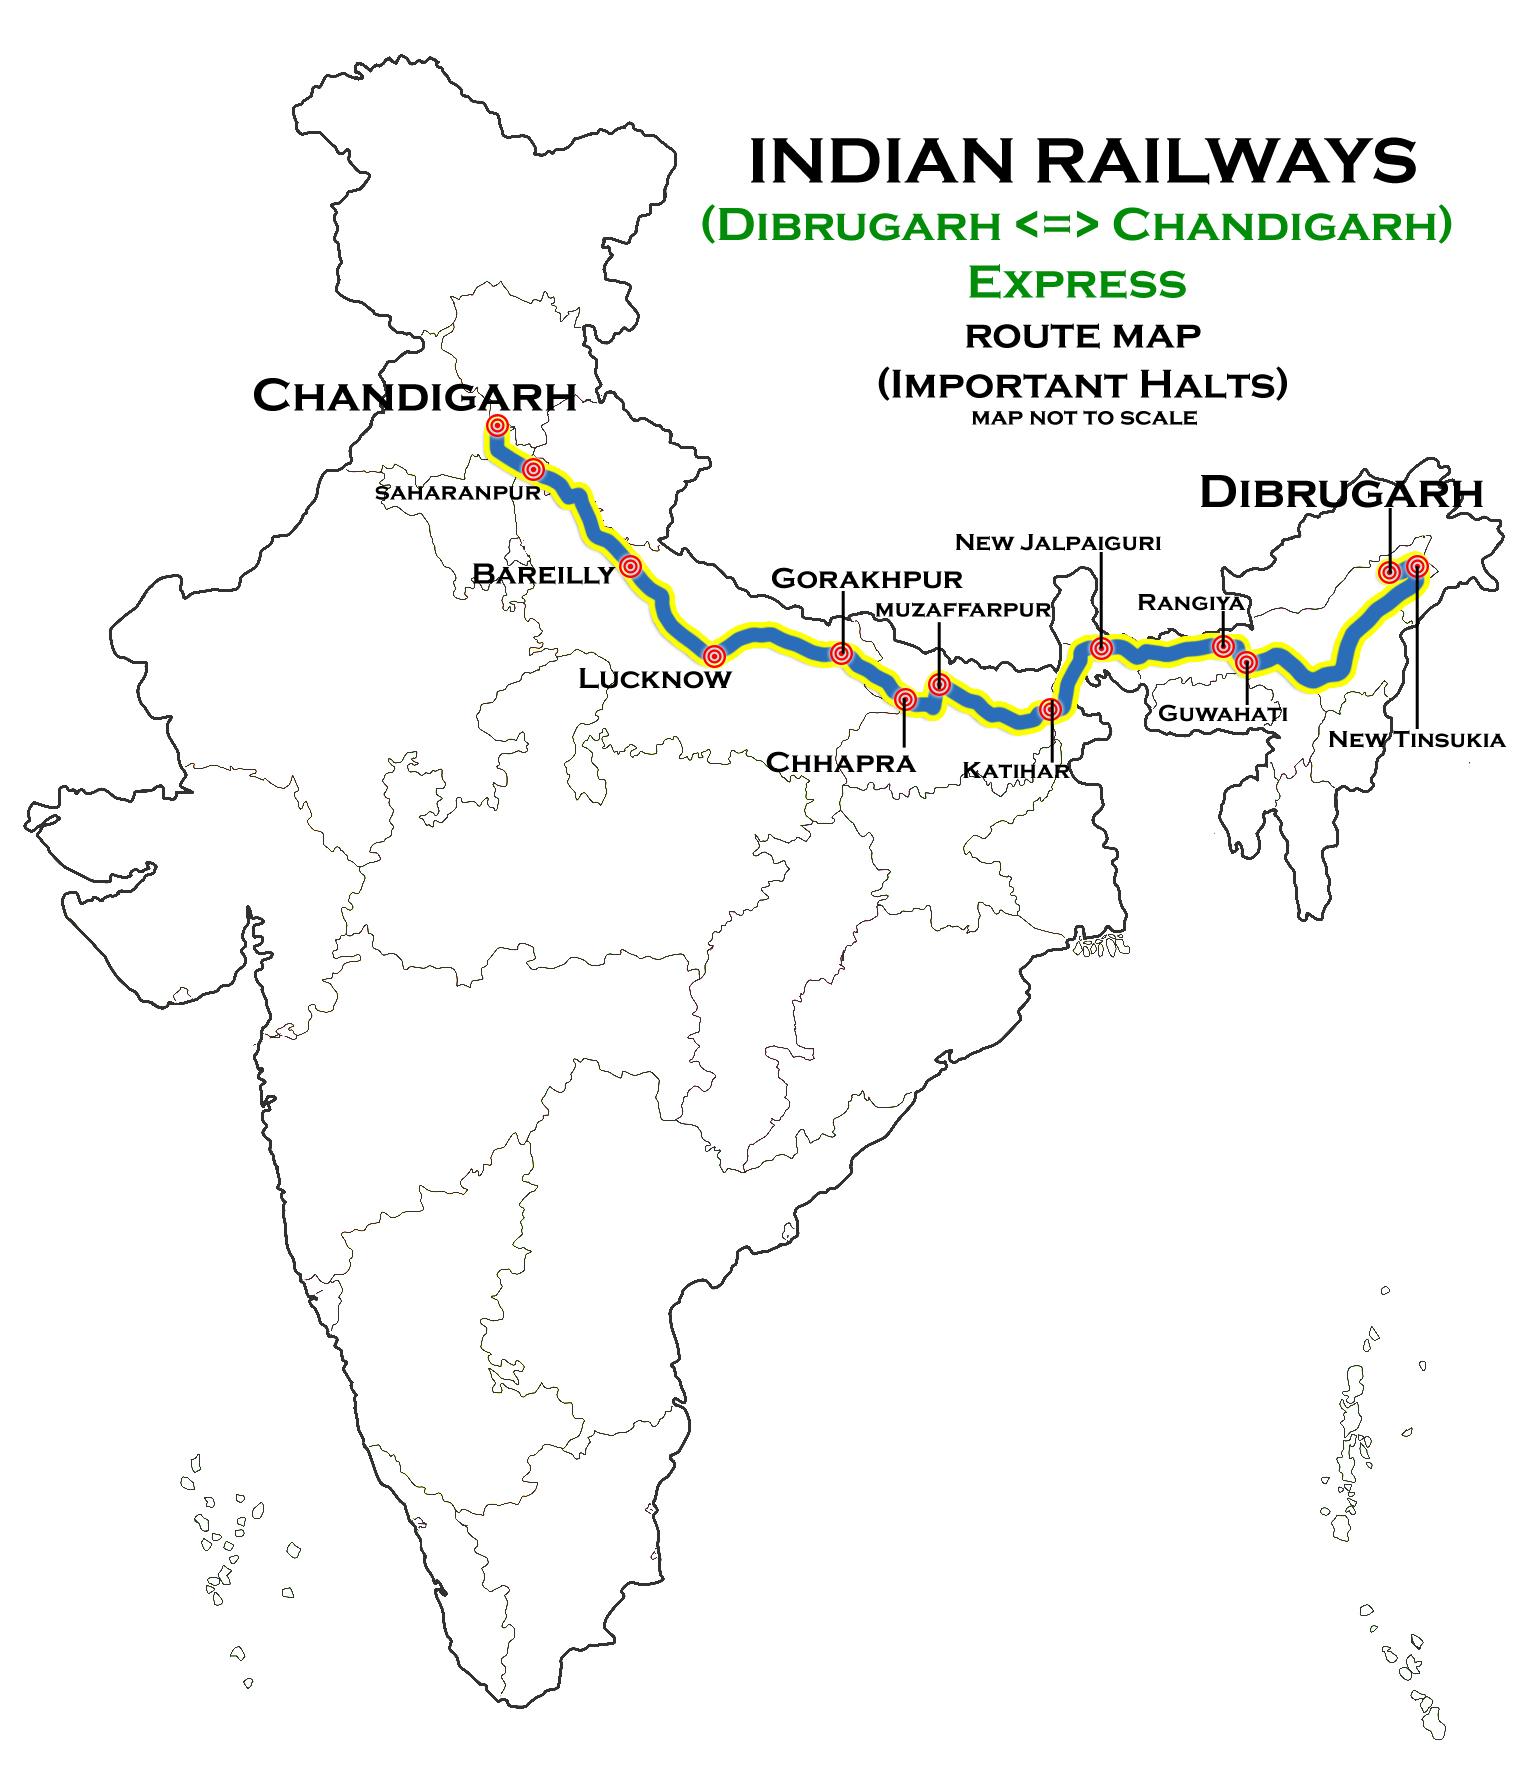 Dibrugarh Chandigarh Express Wikipedia